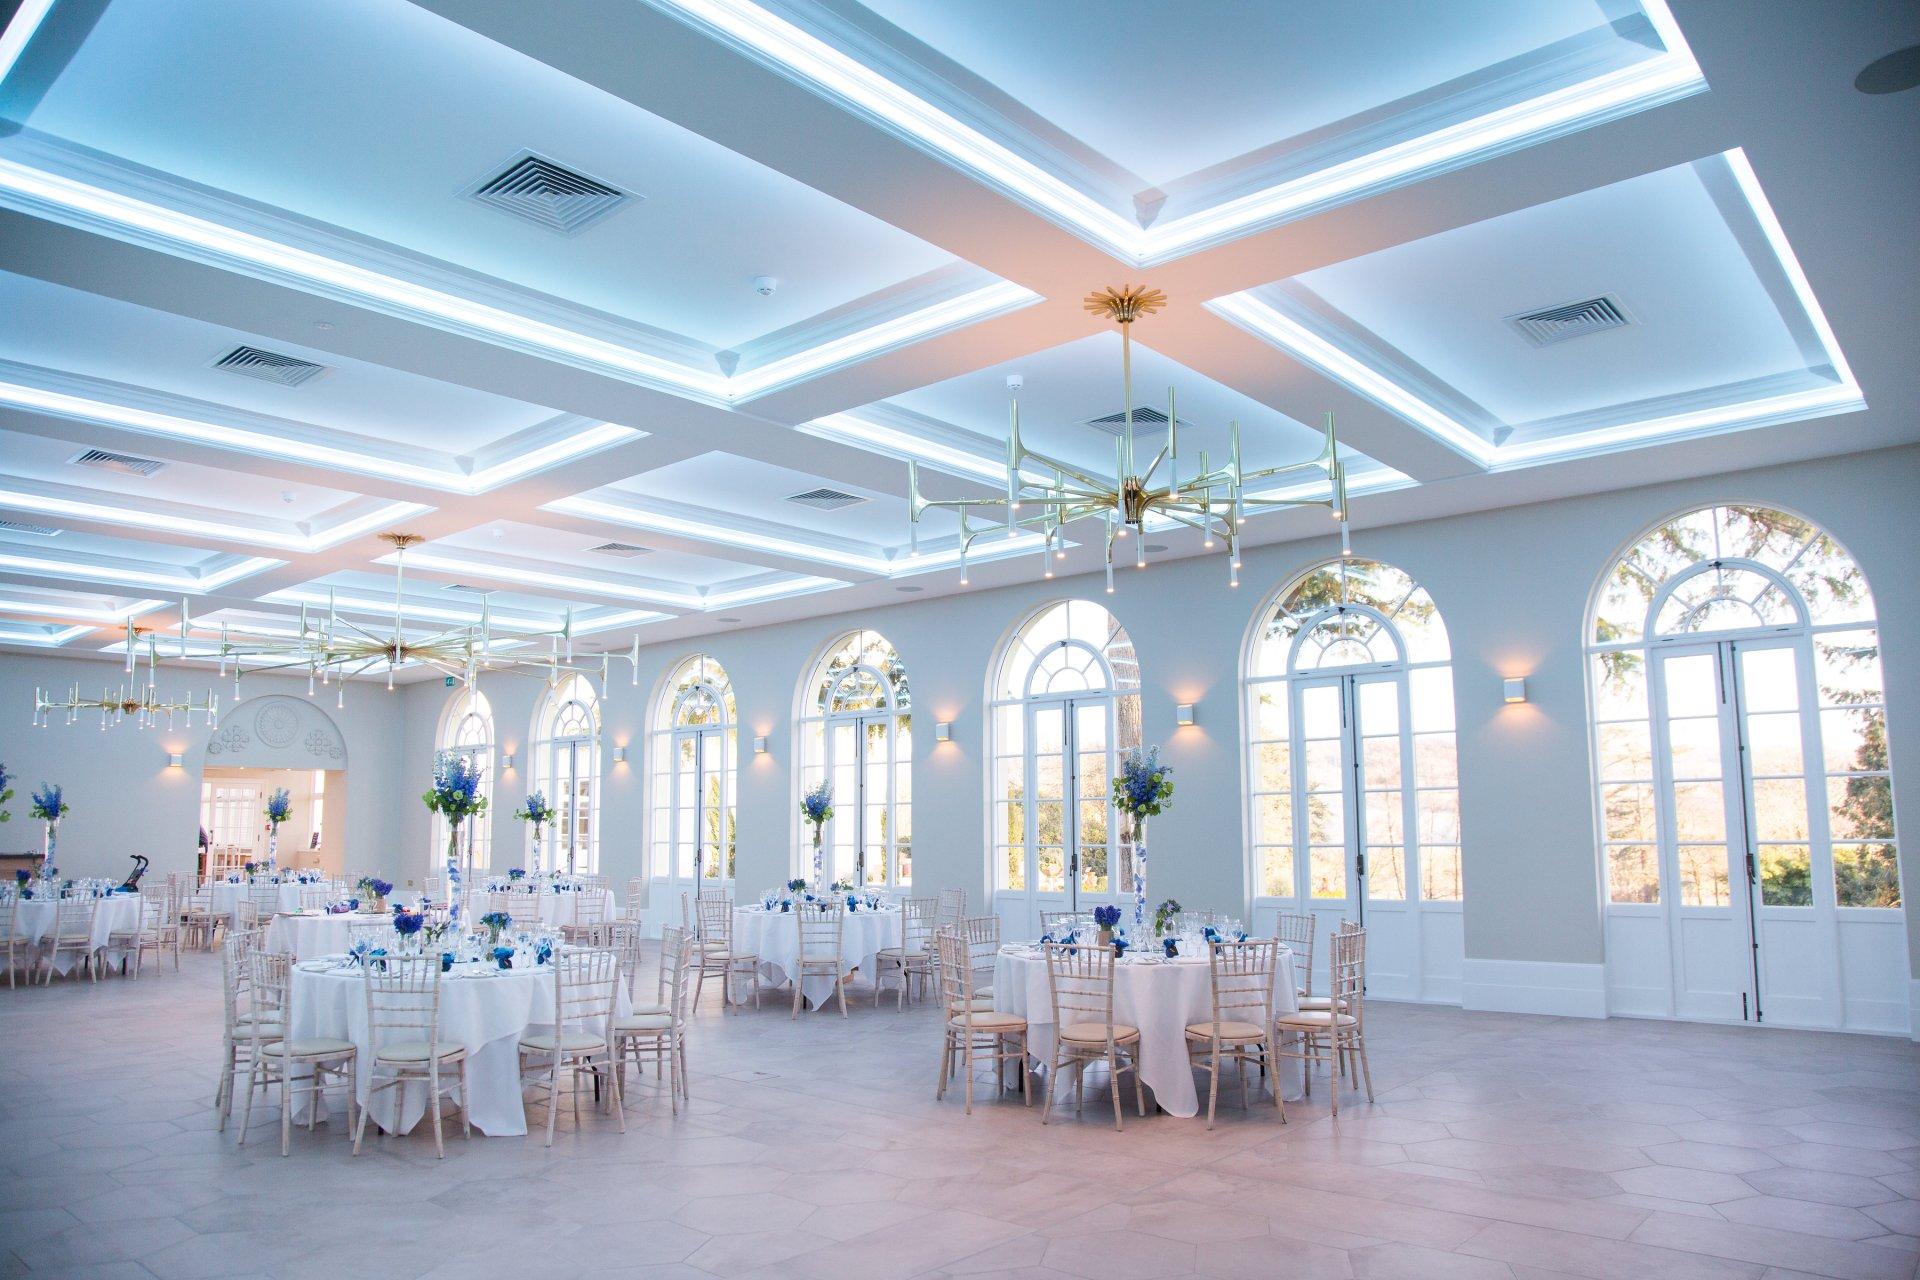 Inside the Orangery, set for a wedding